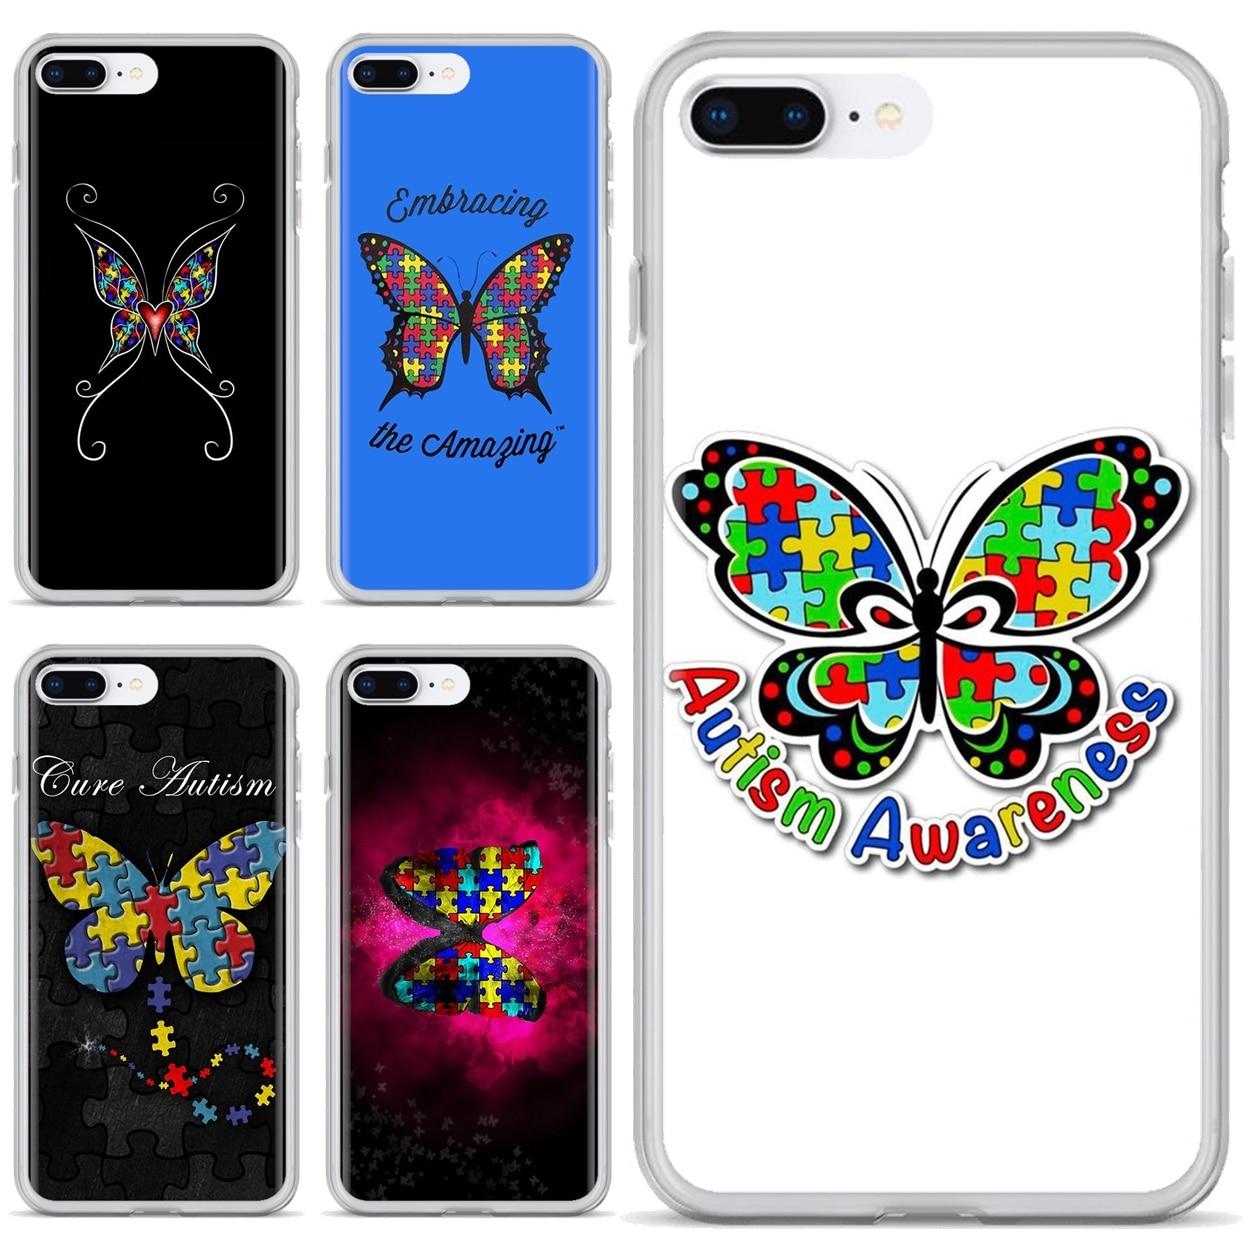 Para Samsung Galaxy A10 A30 A40 A50 A60 A70 S6 activo Nota 10 Plus M30 bolso suave caso hermoso de concienciación sobre el autismo de la mariposa